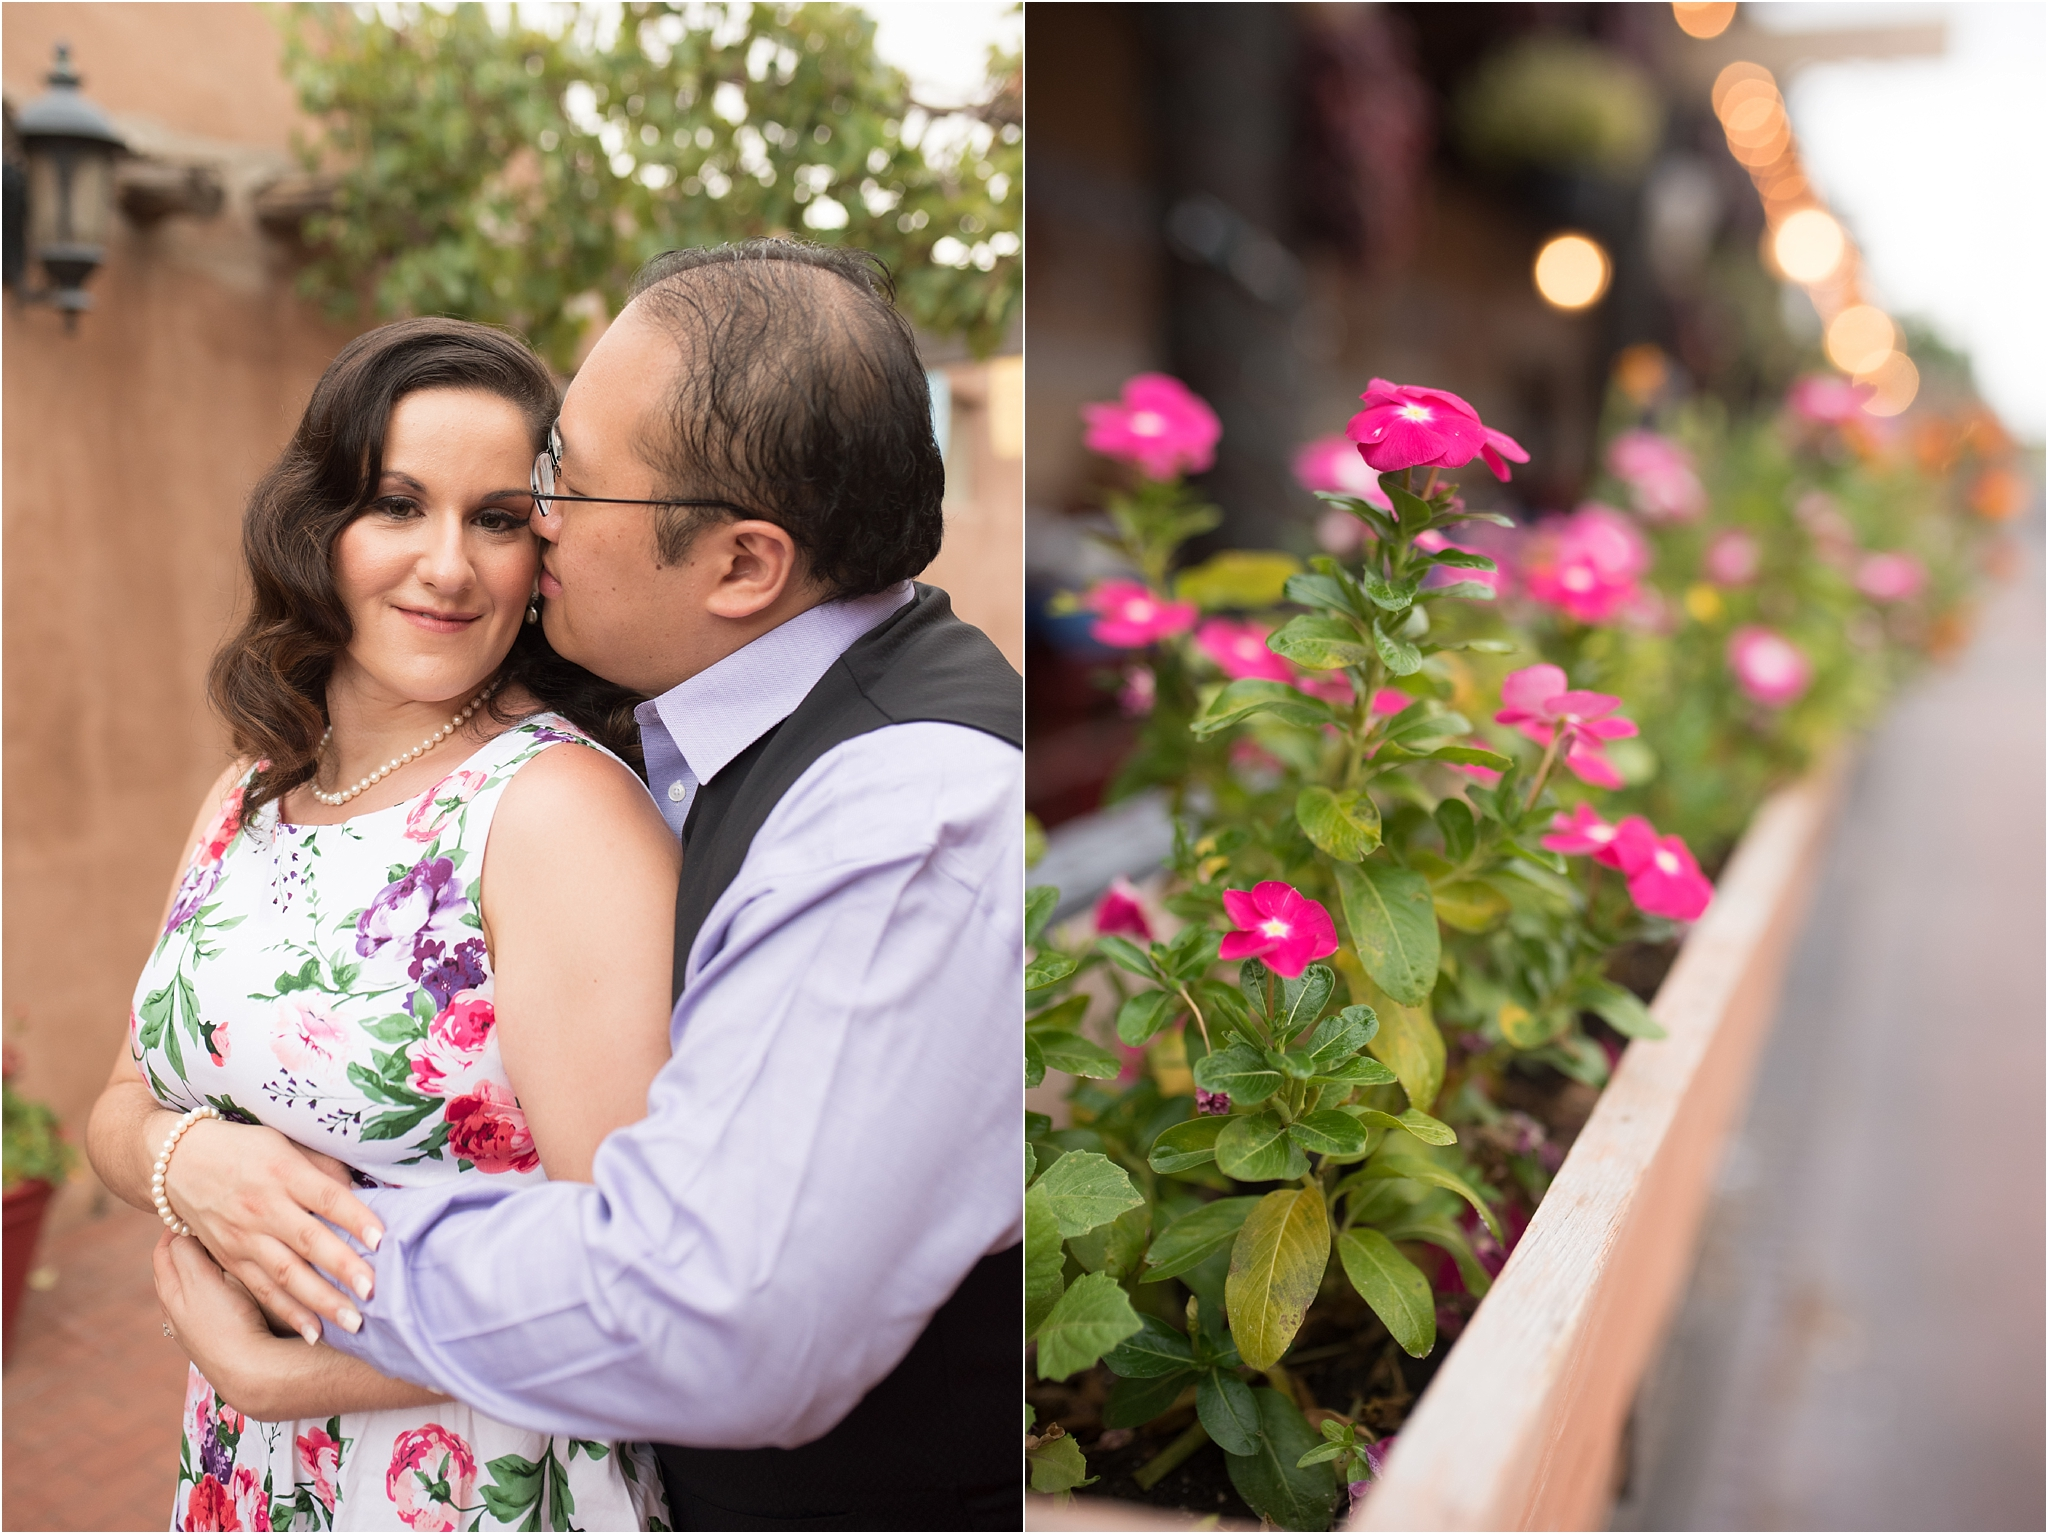 albuquerque wedding photographer, old town engagement session, floral engagement dress, lavender and rose hair and makeup, engagement hair and makeup, new mexico wedding photographer